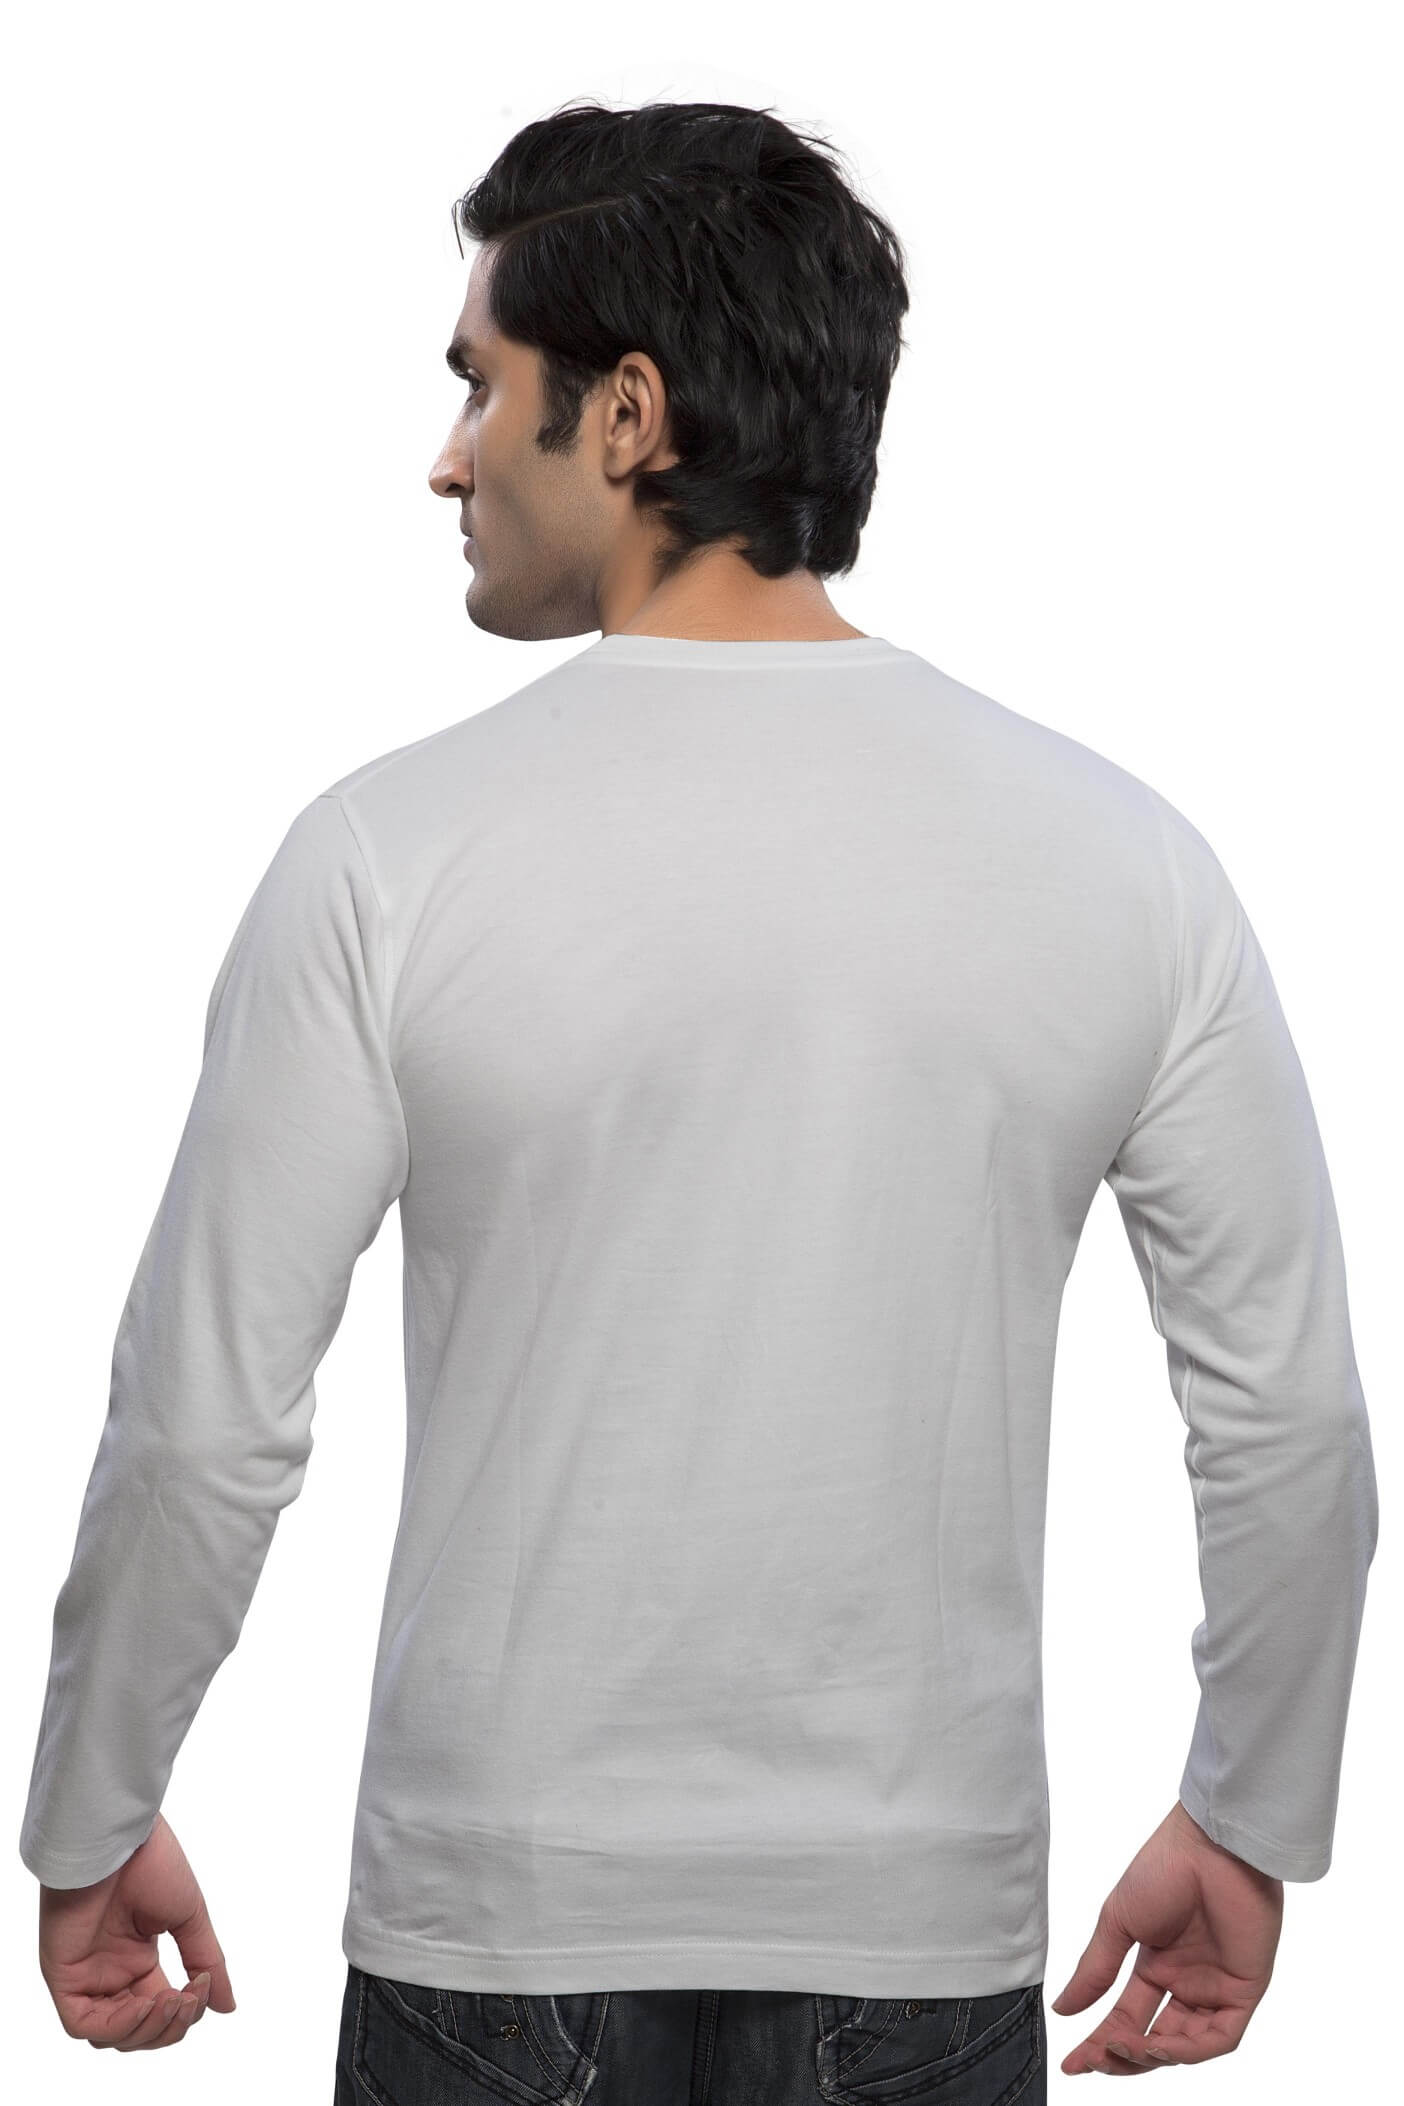 2f0388af7b26 White Plain Full Sleeve T Shirt   Round Neck T-Shirt